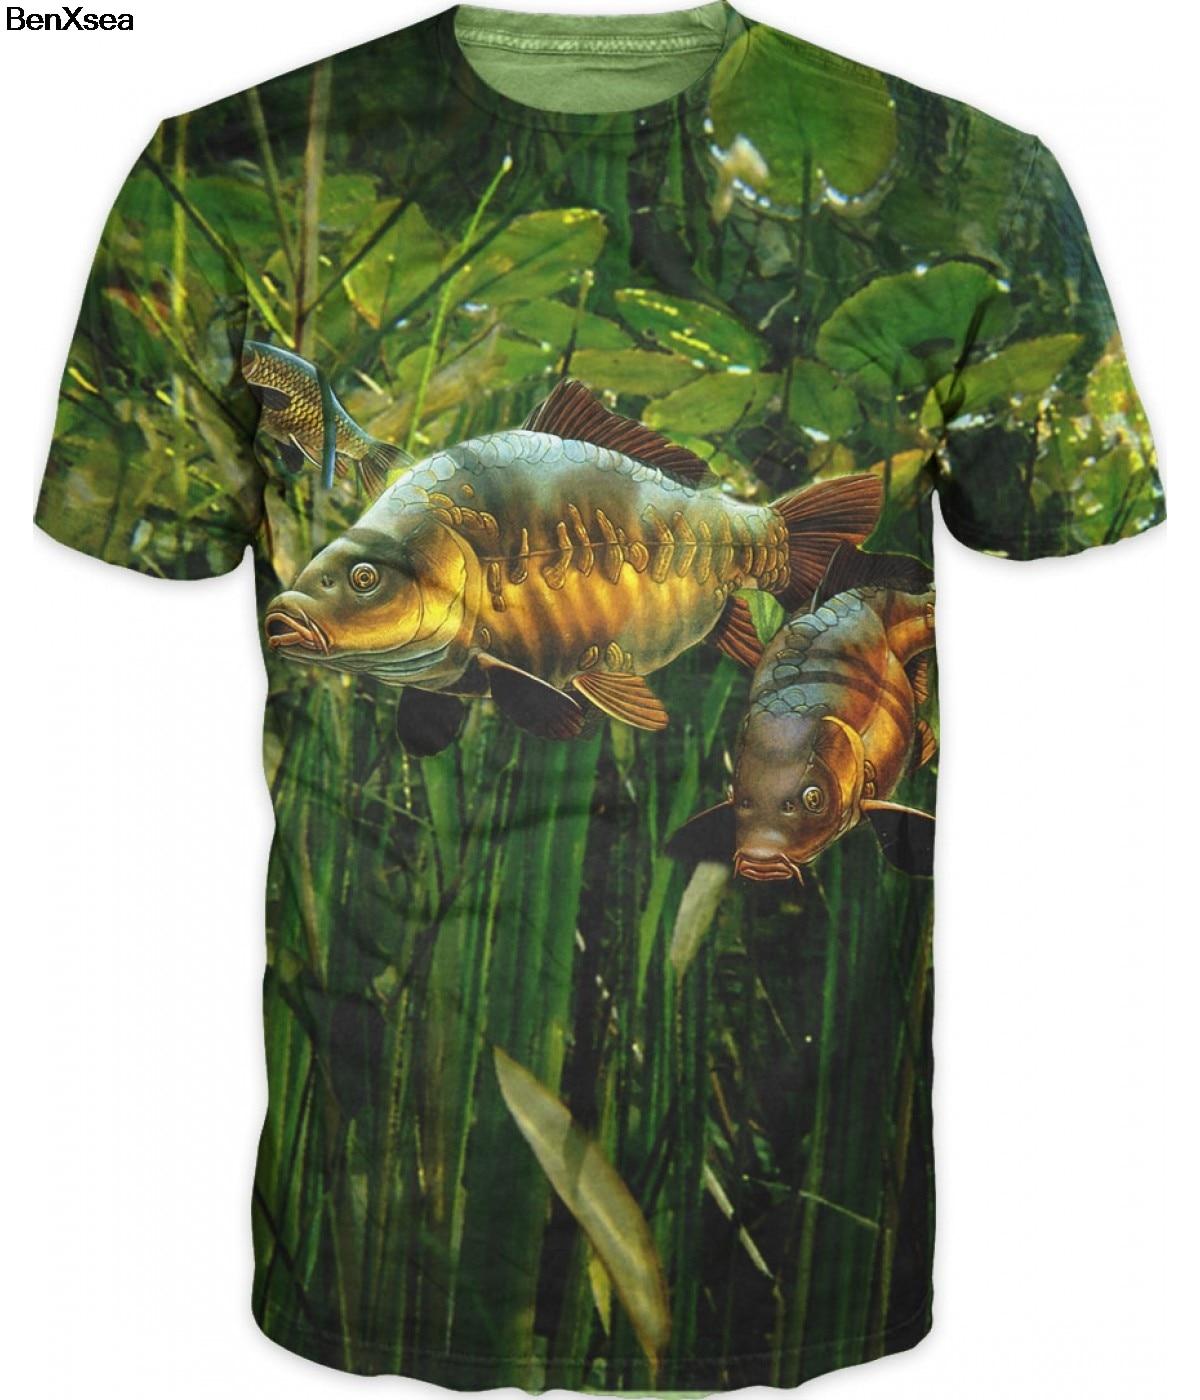 2018 Moda Estilo Muitos 3D Impresso Tee Cool Men 3D T-Shirt Peixe Carpa Hobby Superdimensionada Tshirt Hip Hop